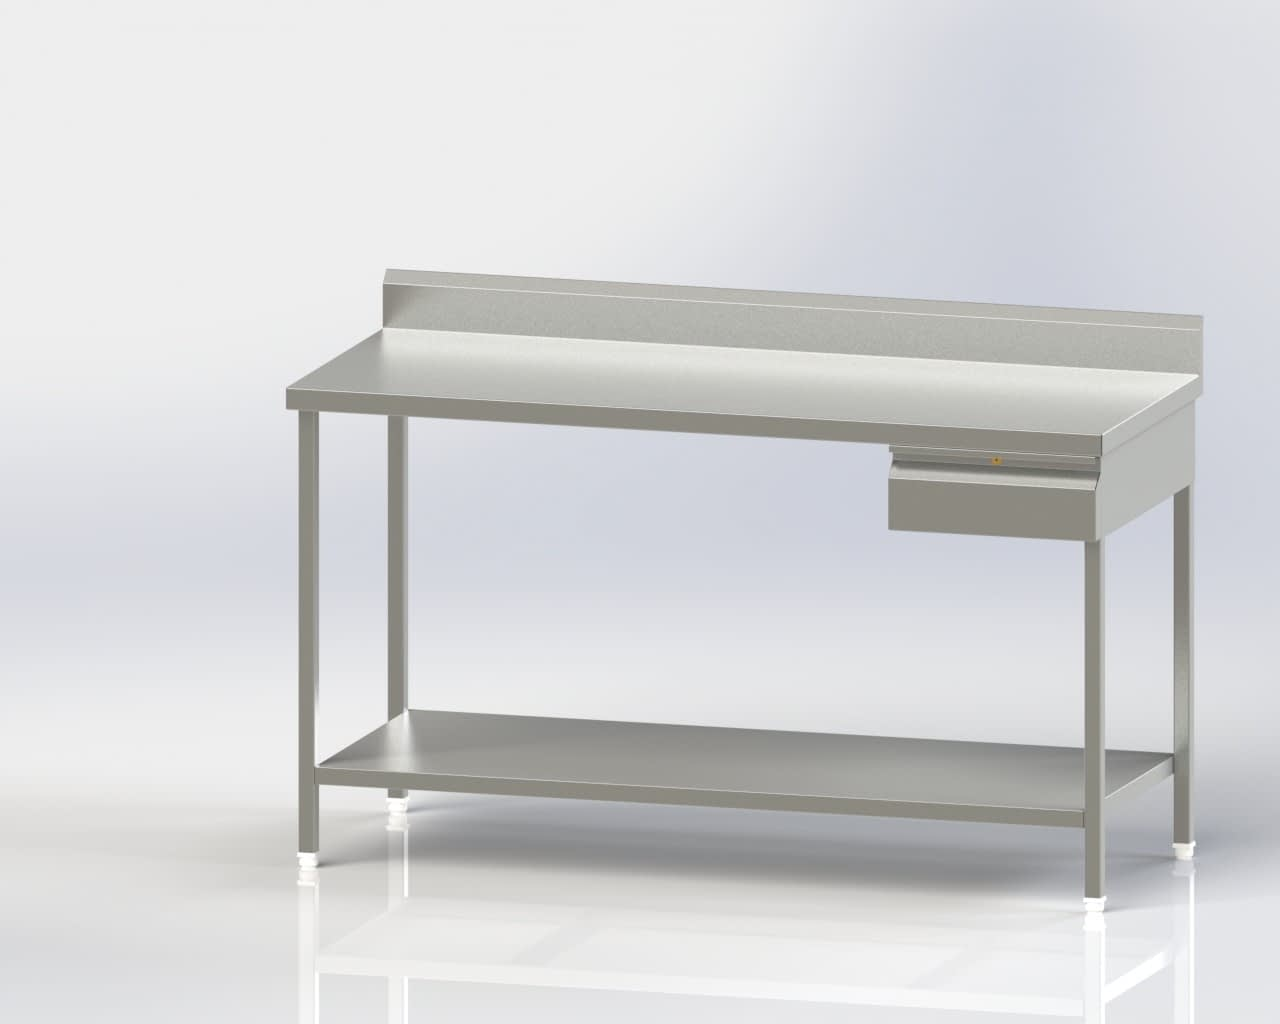 Work Table/under shelf/Single Drawer